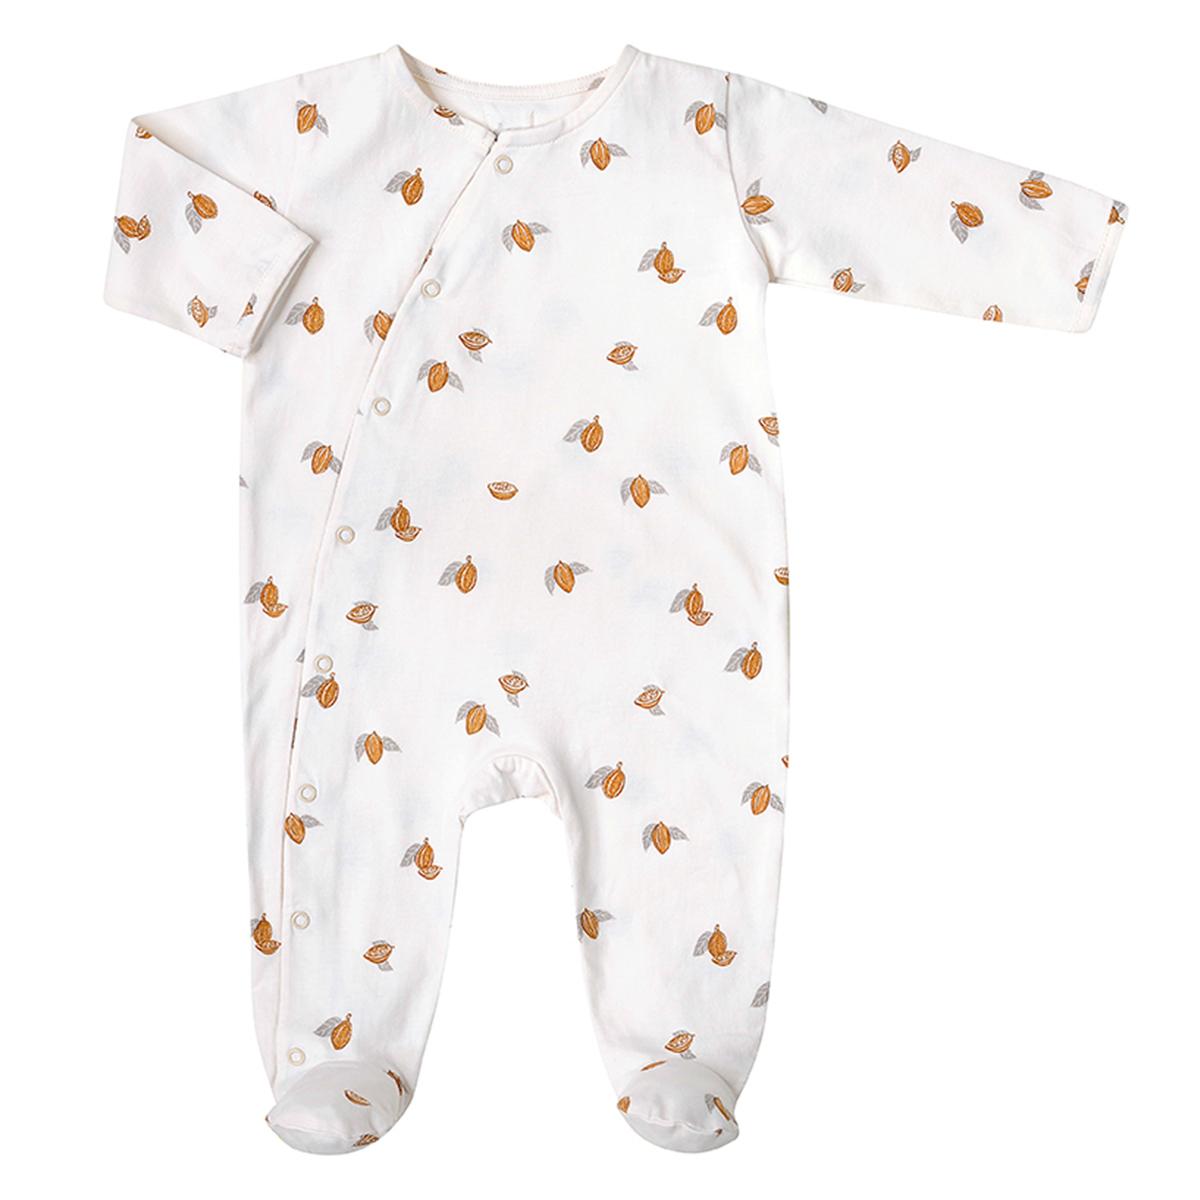 Body & Pyjama Combinaison Jour et Nuit Tonka - 3 Mois Combinaison Jour et Nuit Tonka - 3 Mois